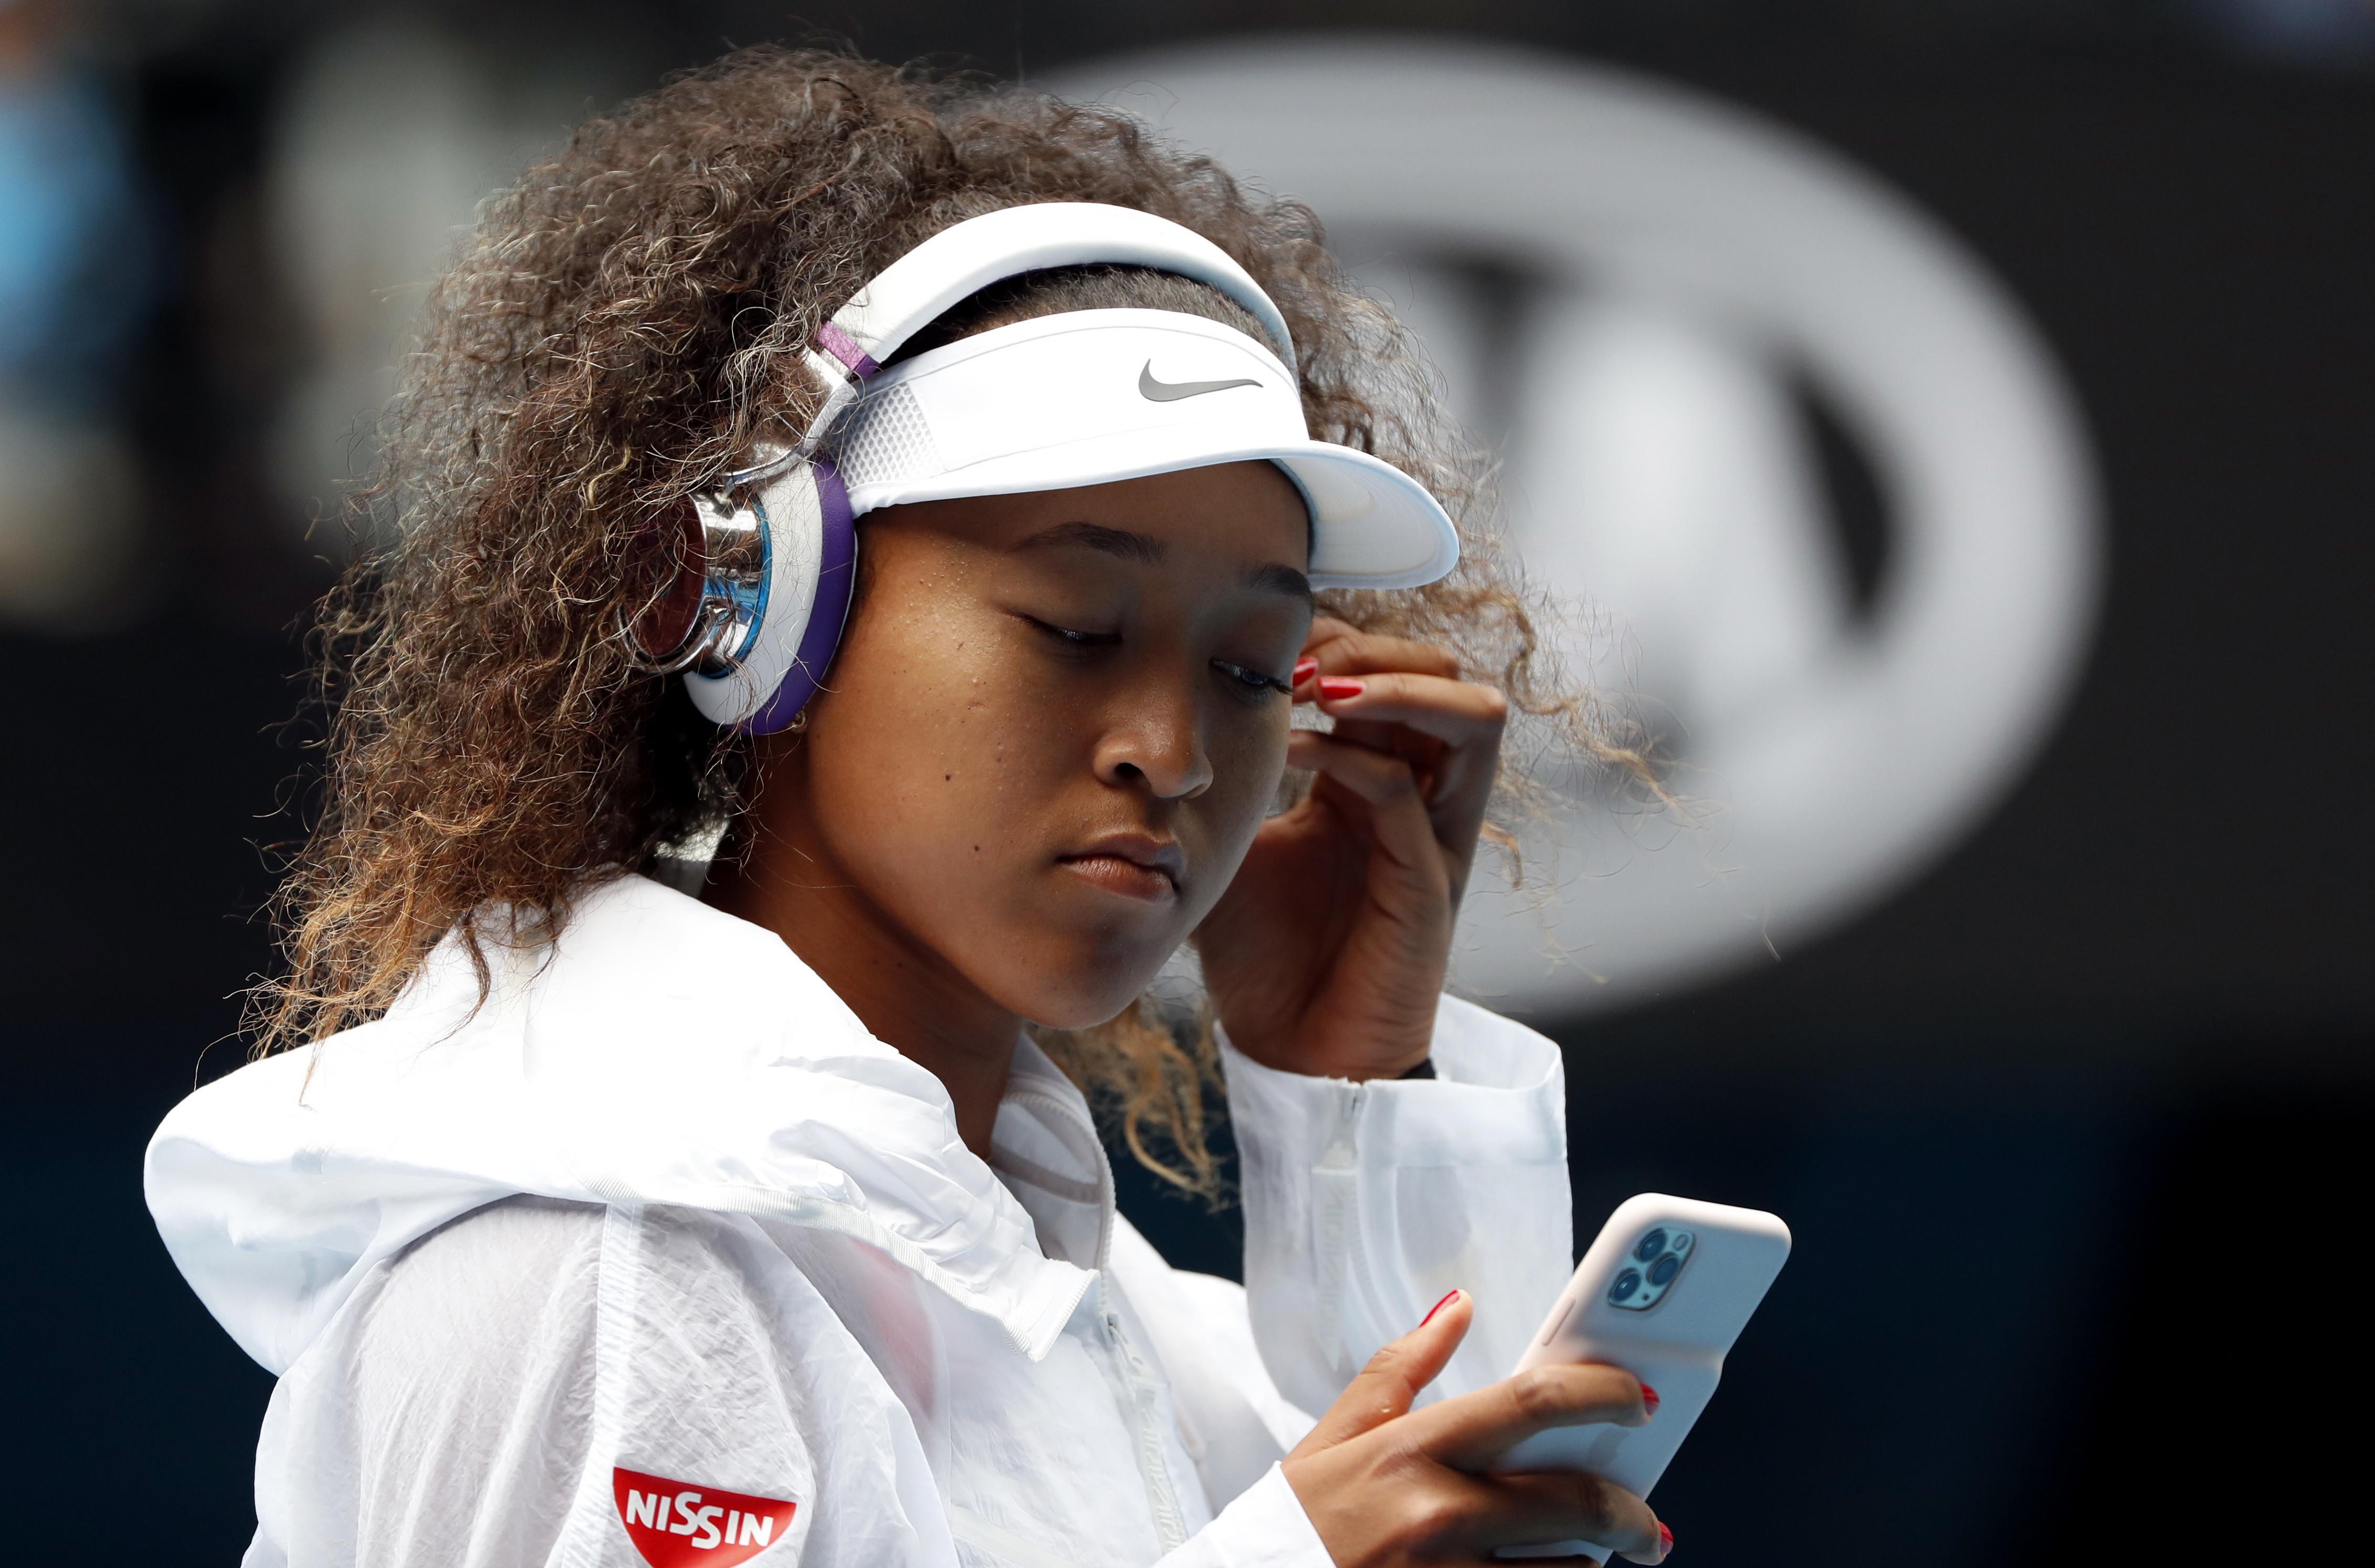 Tennis - Australian Open - First Round - Melbourne Park, Melbourne, Australia - January 20, 2020 Japan's Naomi Osaka looks at her mobile phone before her match against Czech Republic's Marie Bouzkova